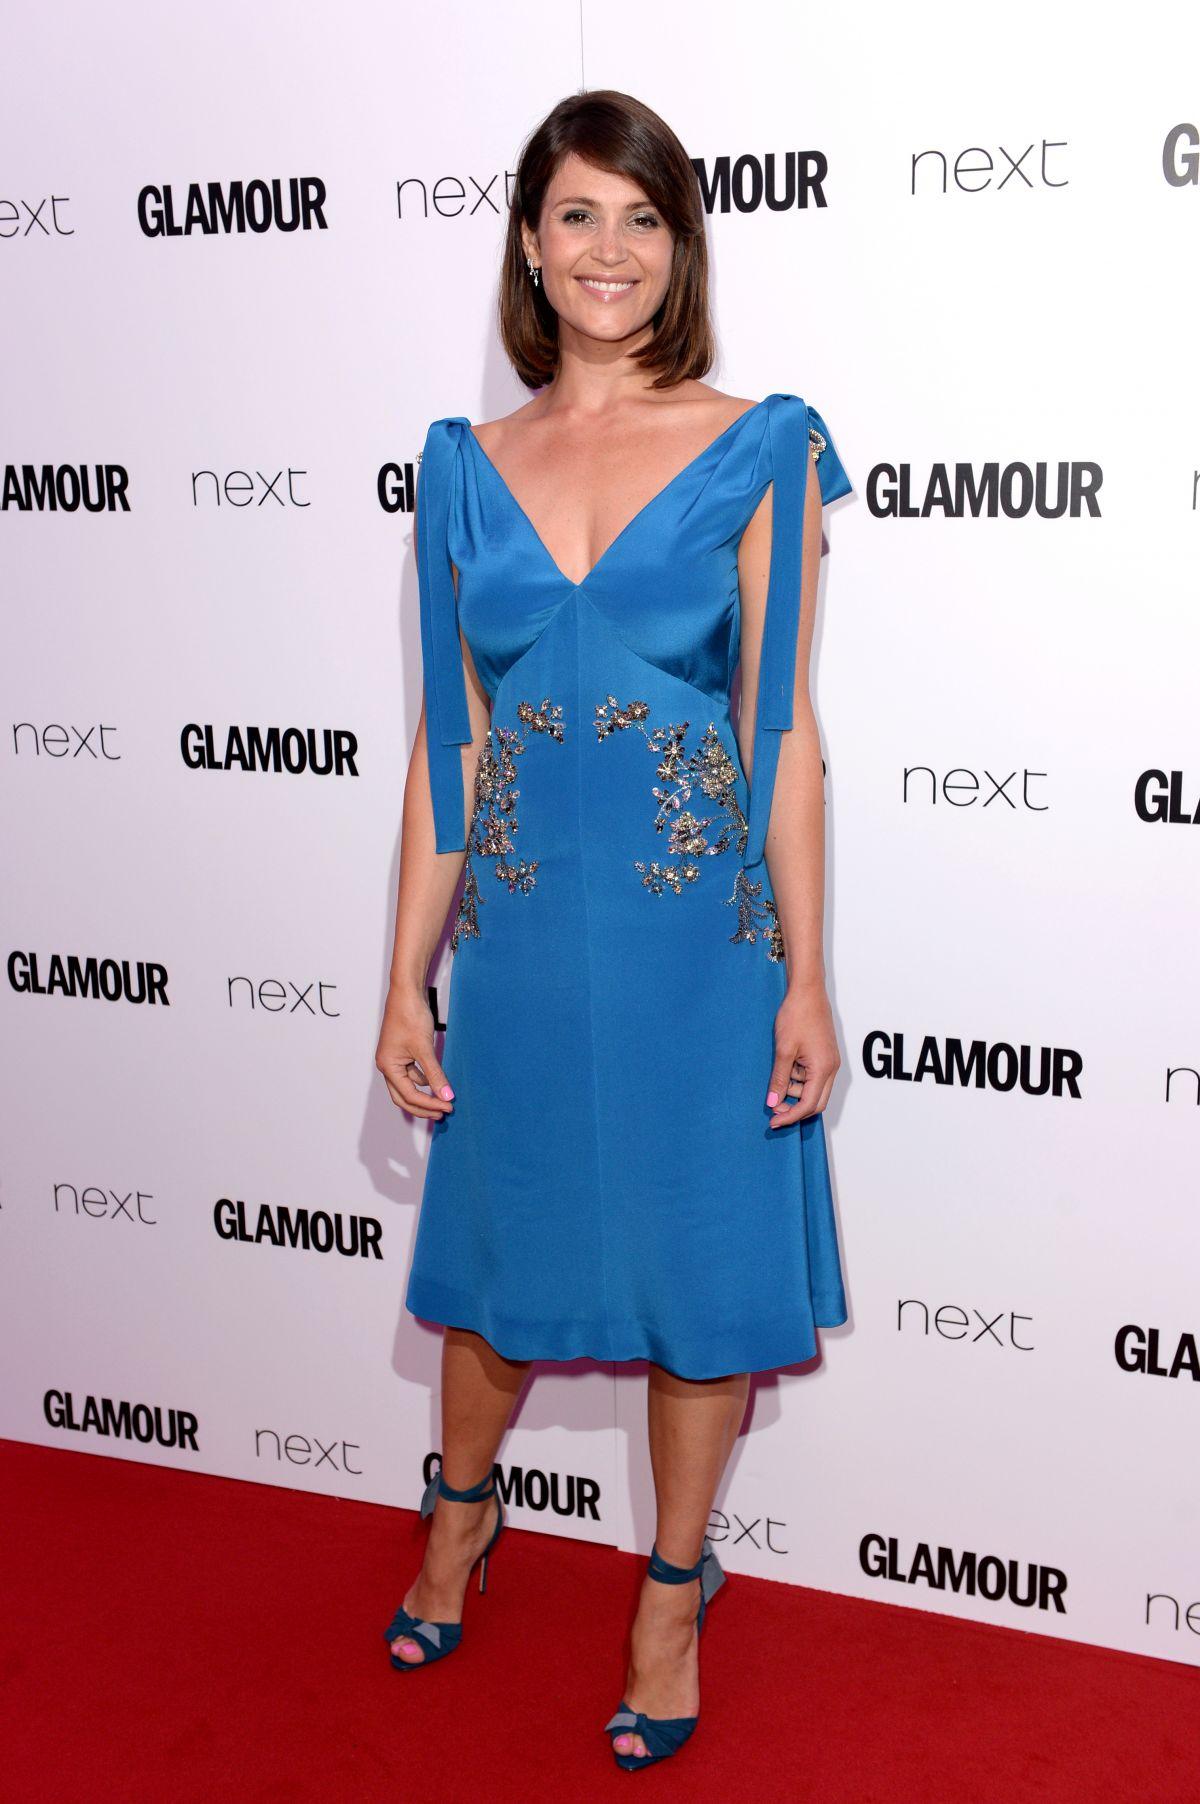 GEMMA ARTERTON at Glamour Women of the Year Awards 2016 in London 06/07/2016